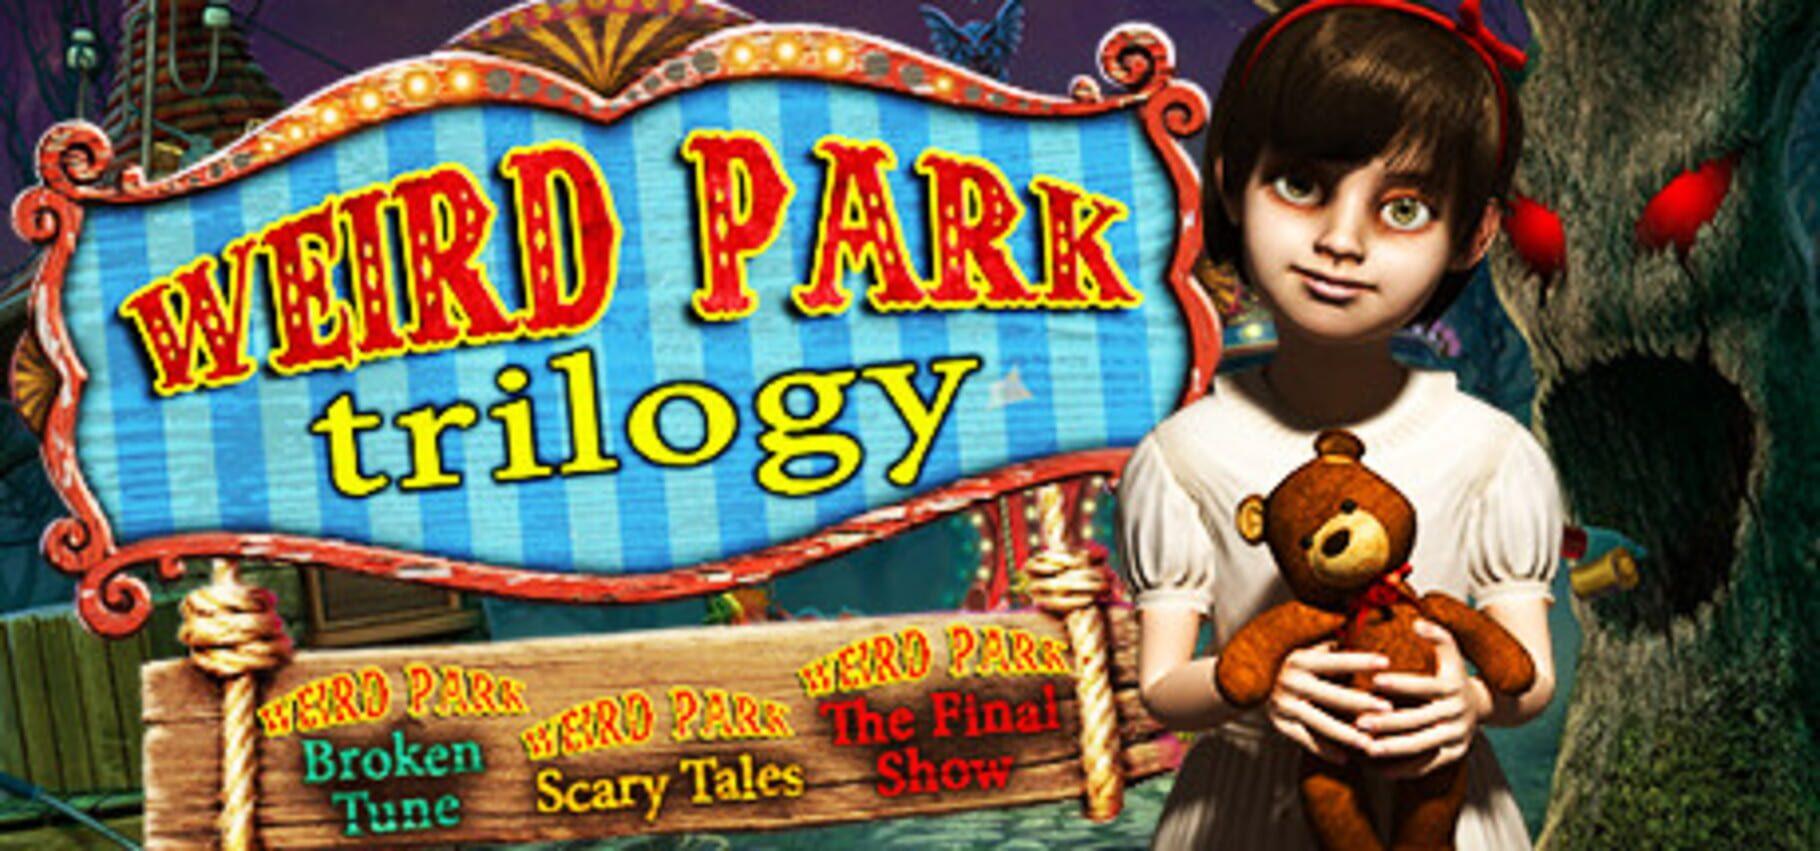 buy Weird Park: The Final Show cd key for all platform